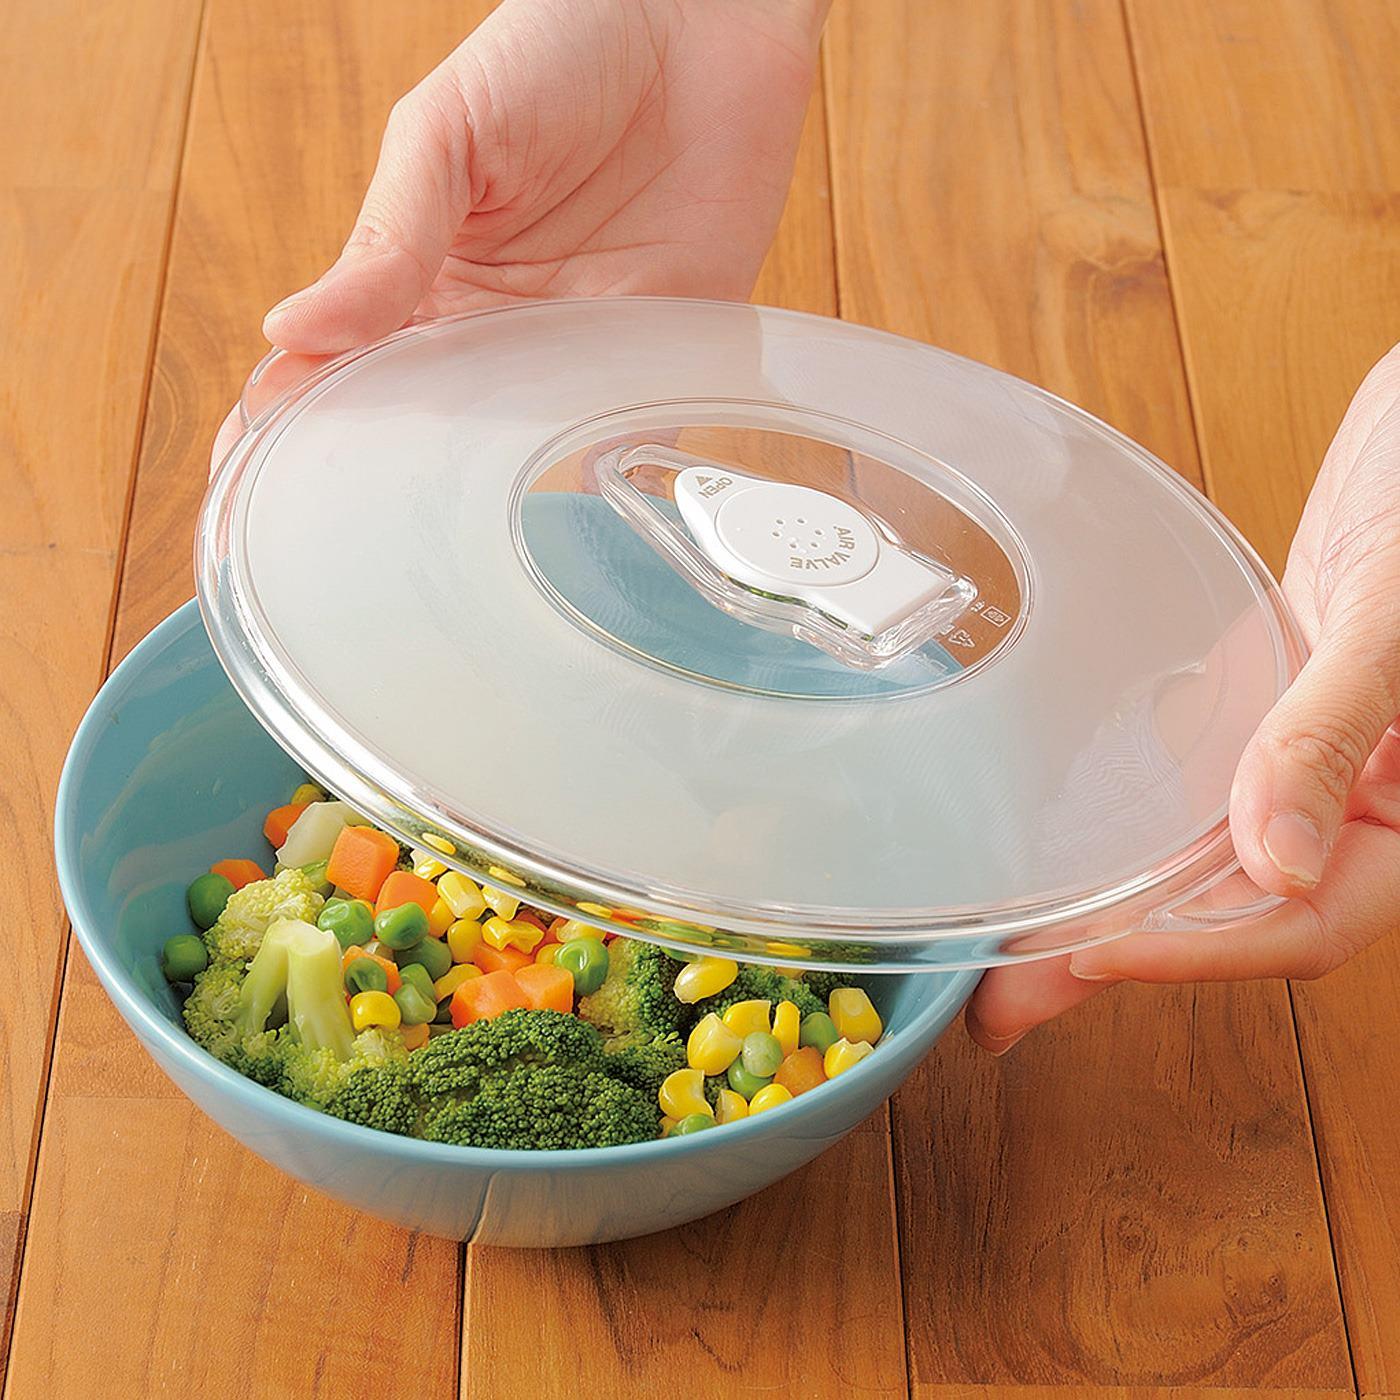 HOW TO COOK (1)保存したい食品・食材を手持ちの容器に入れ、ふたをのせます。